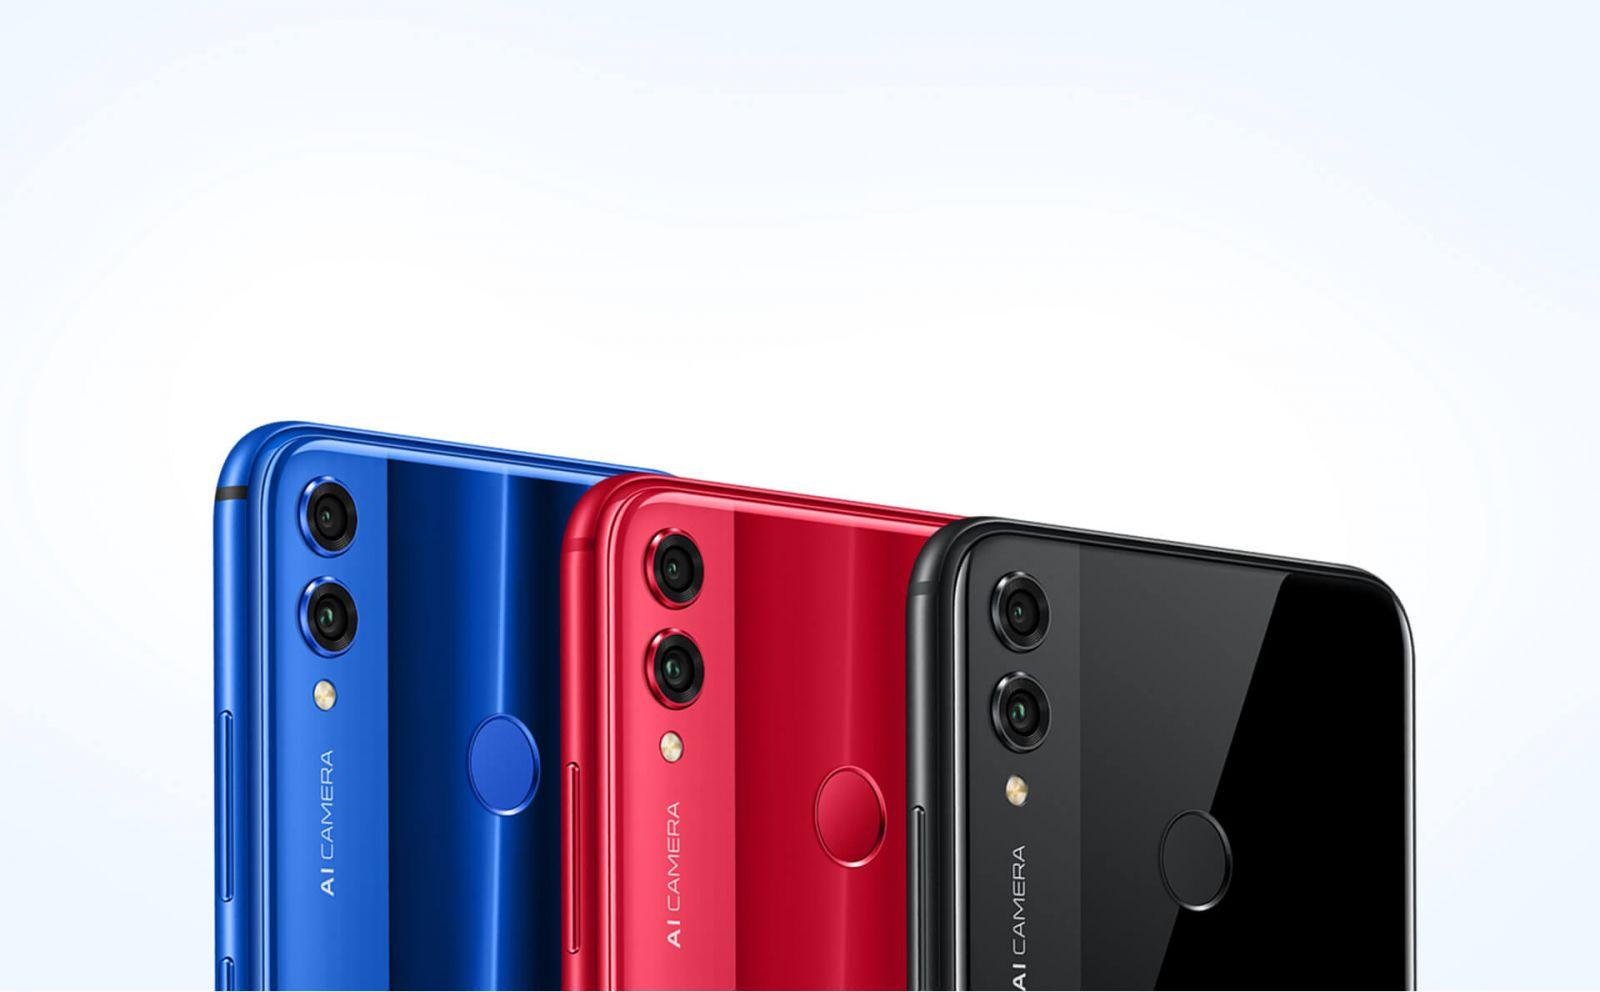 Huawei Honor 8X CENA 225€ na AKCIJI Prodaja Beograd Srbija